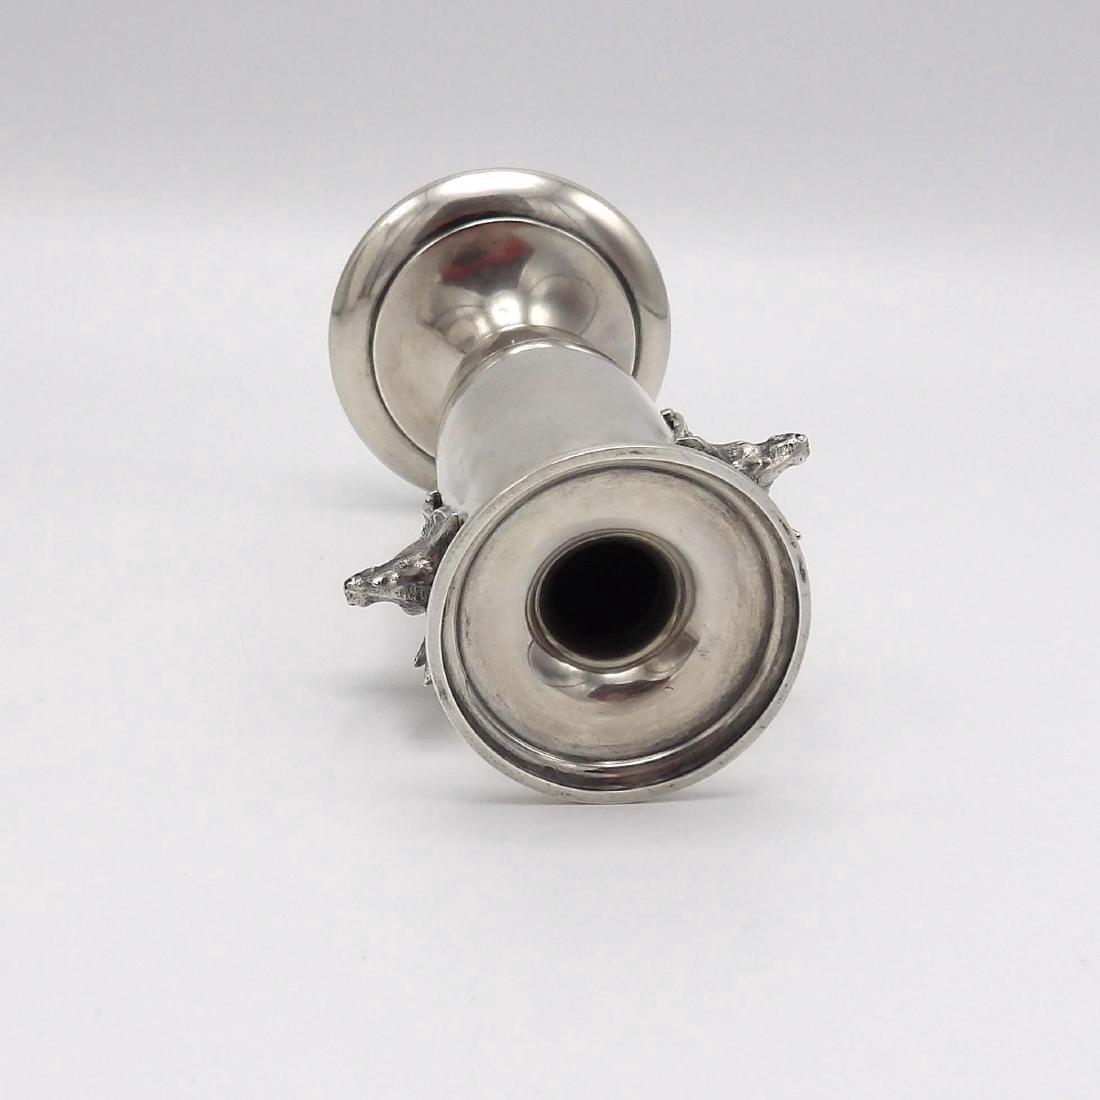 Antique Gorham Saxon Stag Sterling Silver Bud Vase 1860 - 6